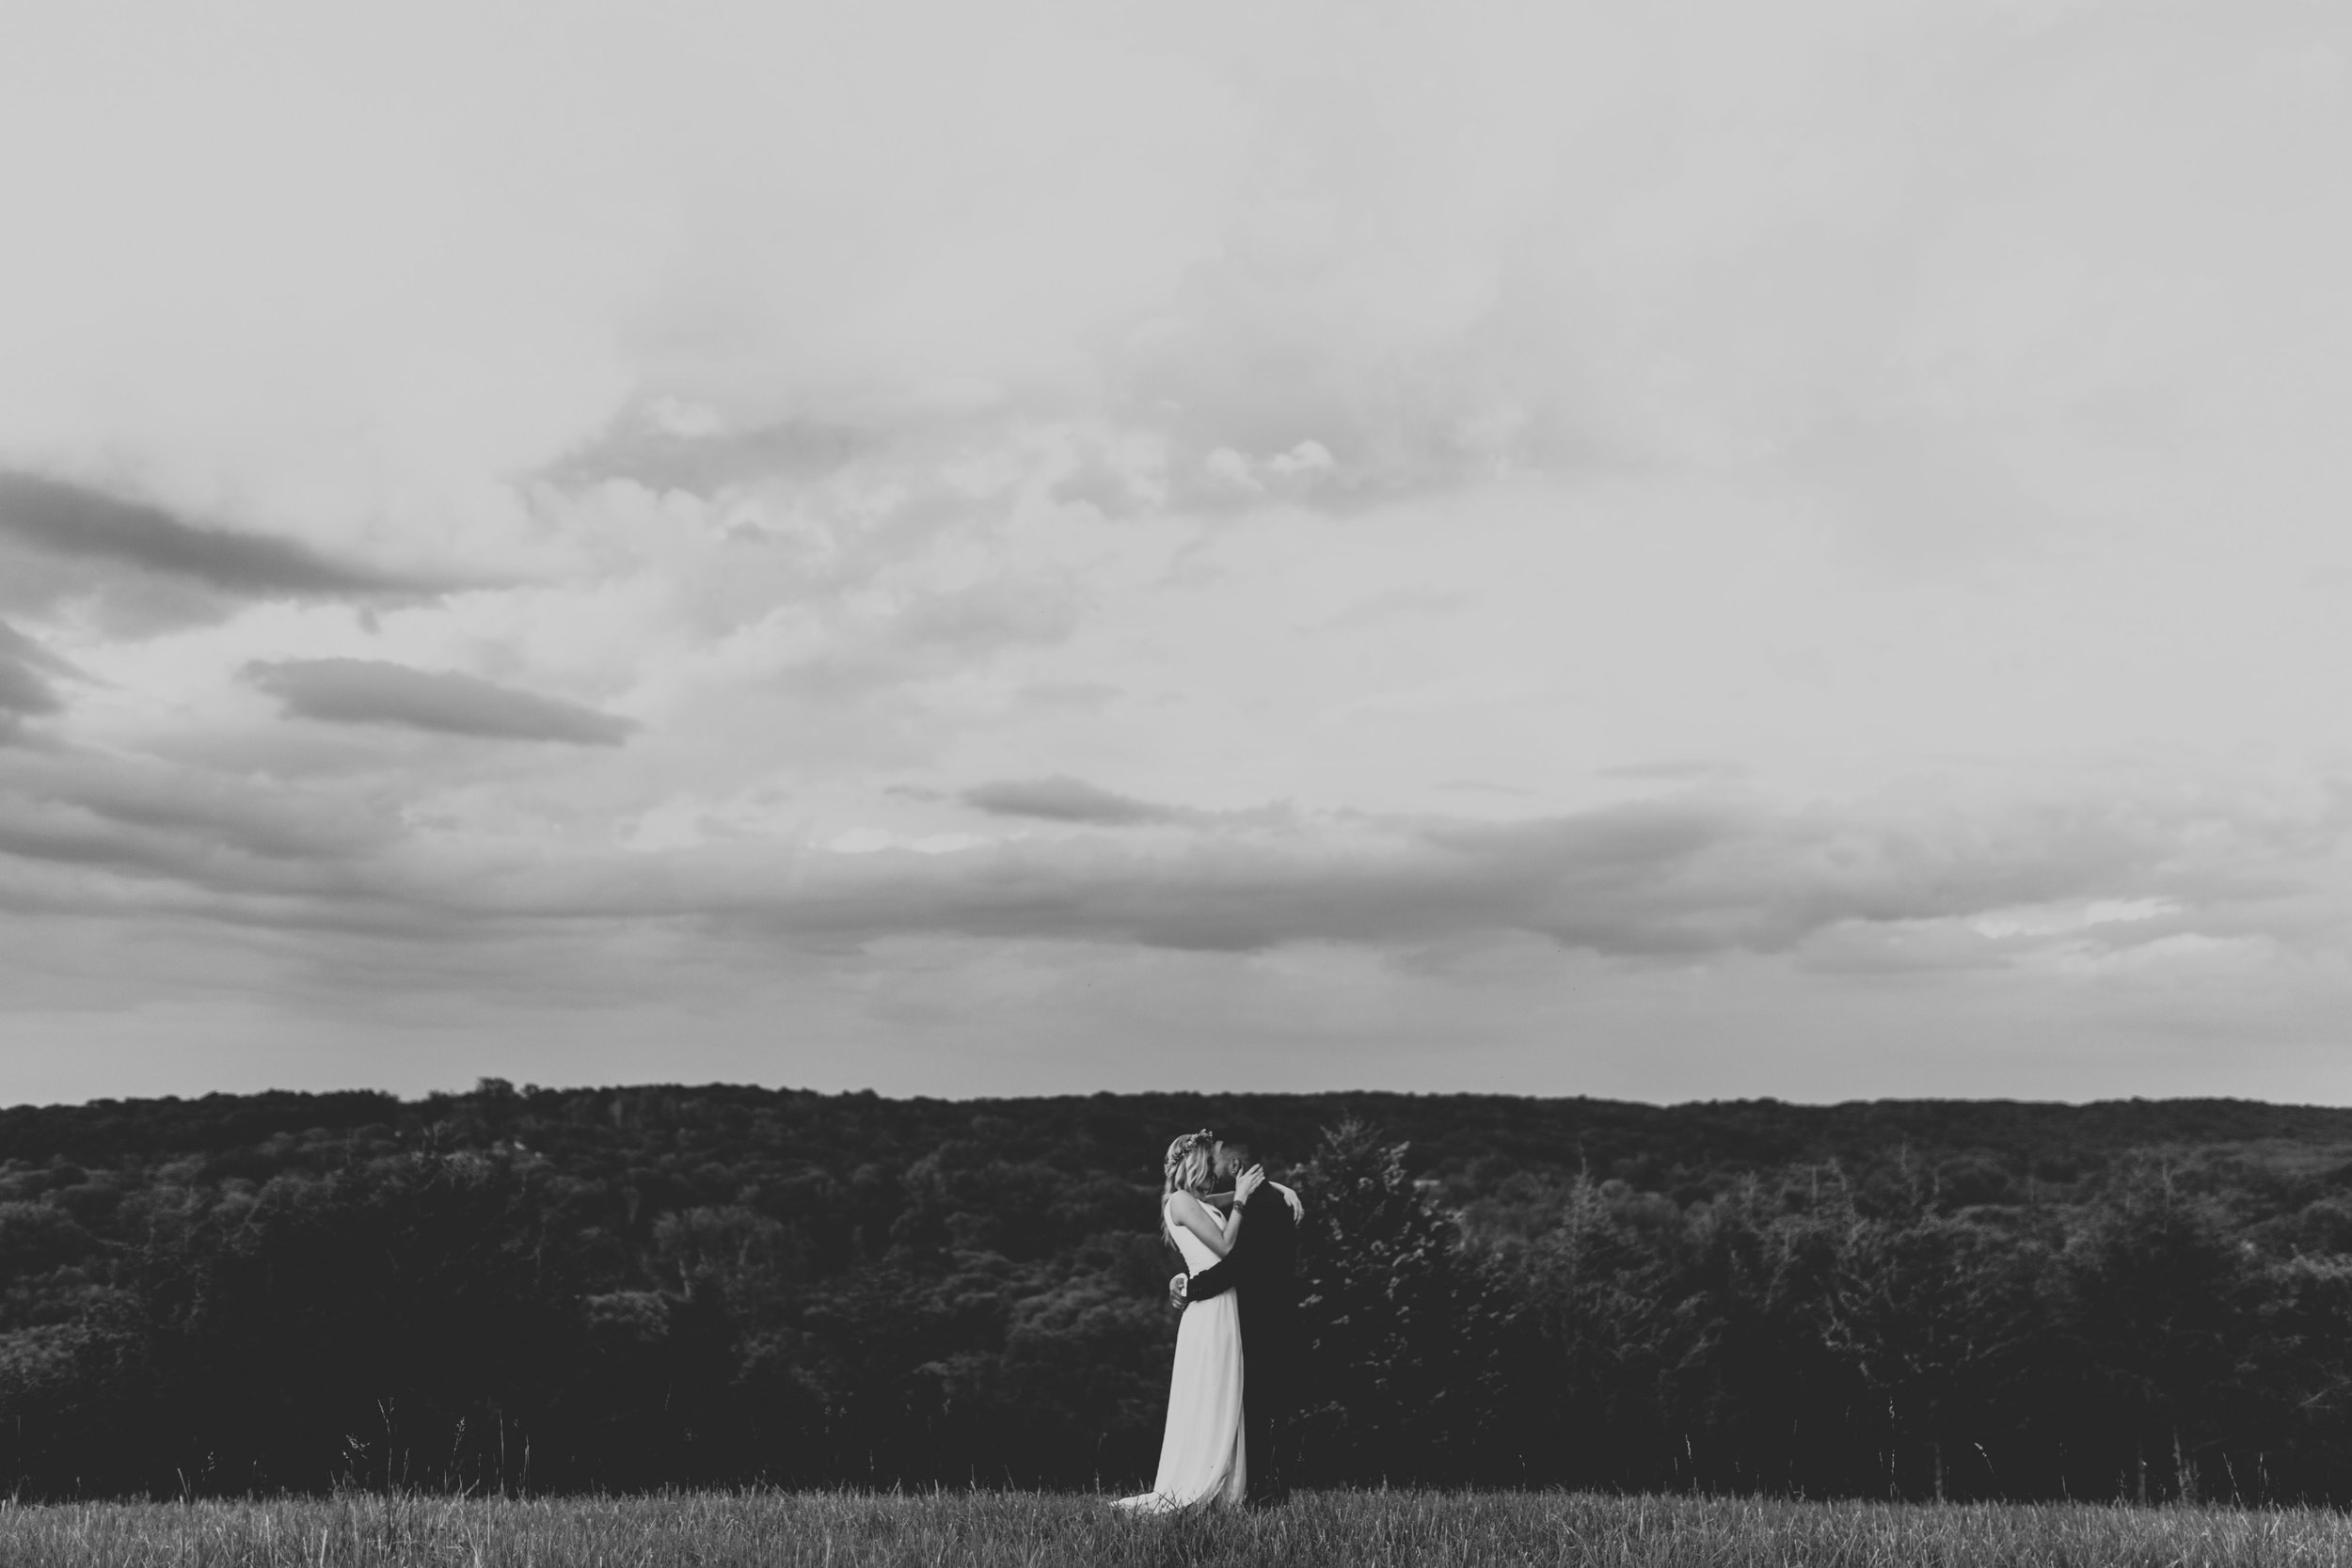 Emily and Zach-Wedding Finals 2-0150.jpg